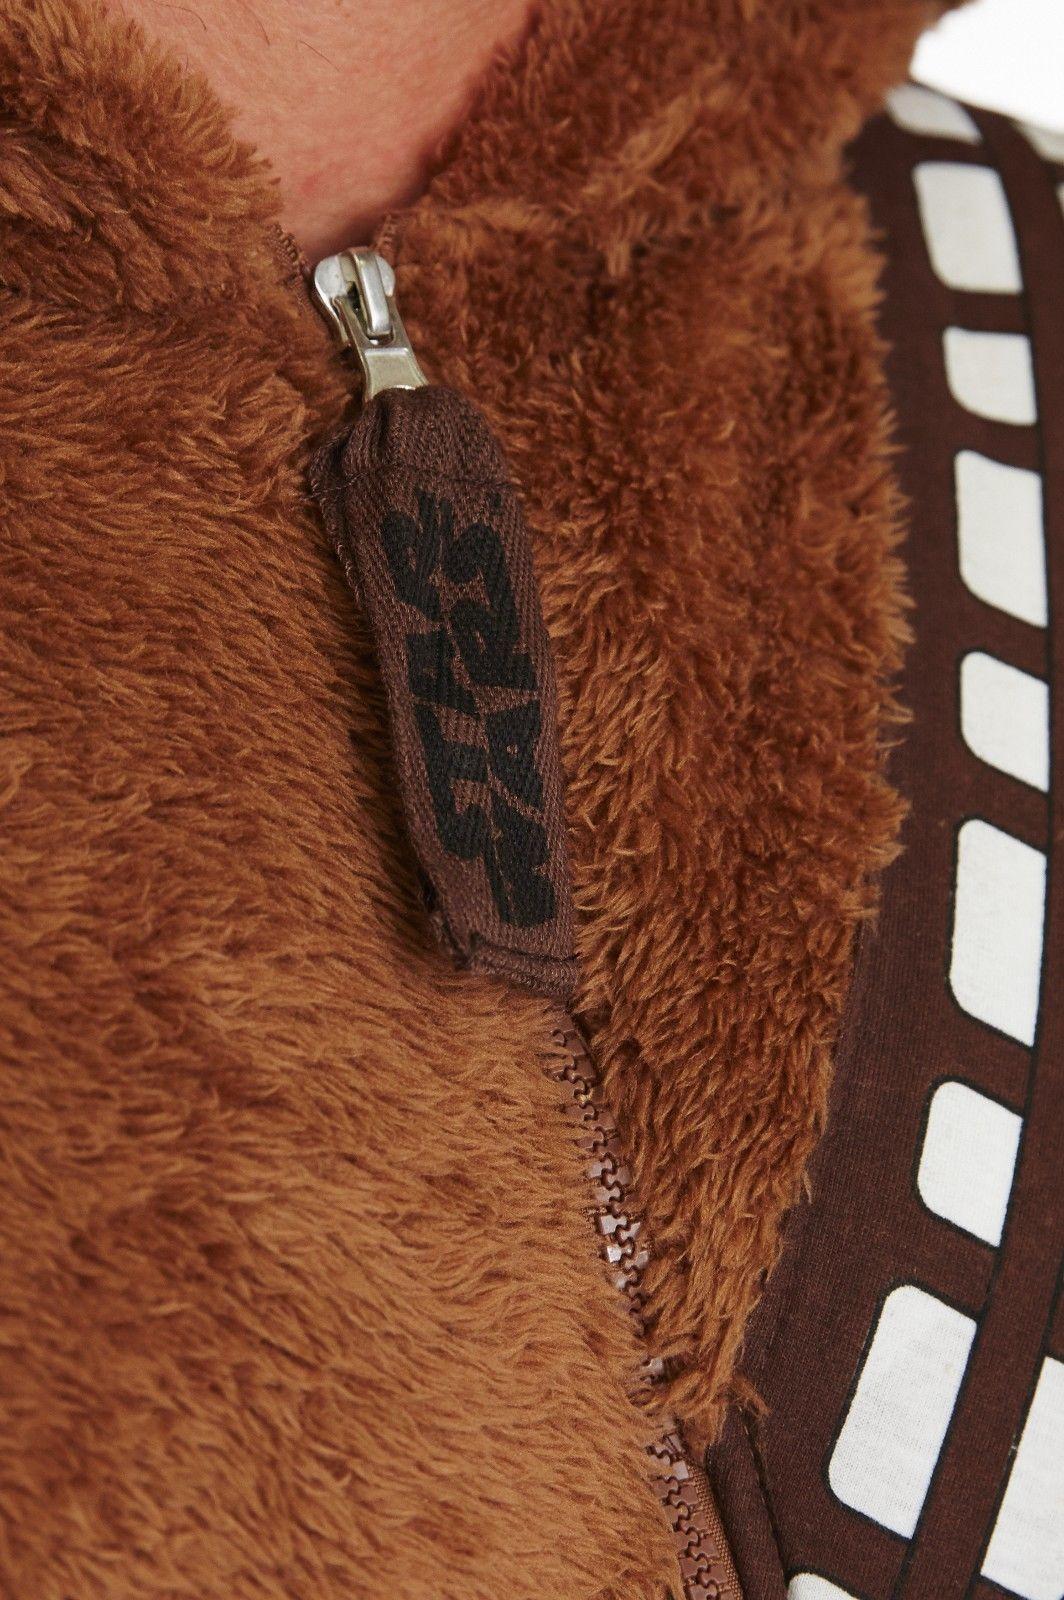 Star Wars Chewbacca Onesie Jumpsuit Costume (Adult) ... & Star Wars Chewbacca Onesie Jumpsuit Costume (Adult) u2013 Simply NikNaks